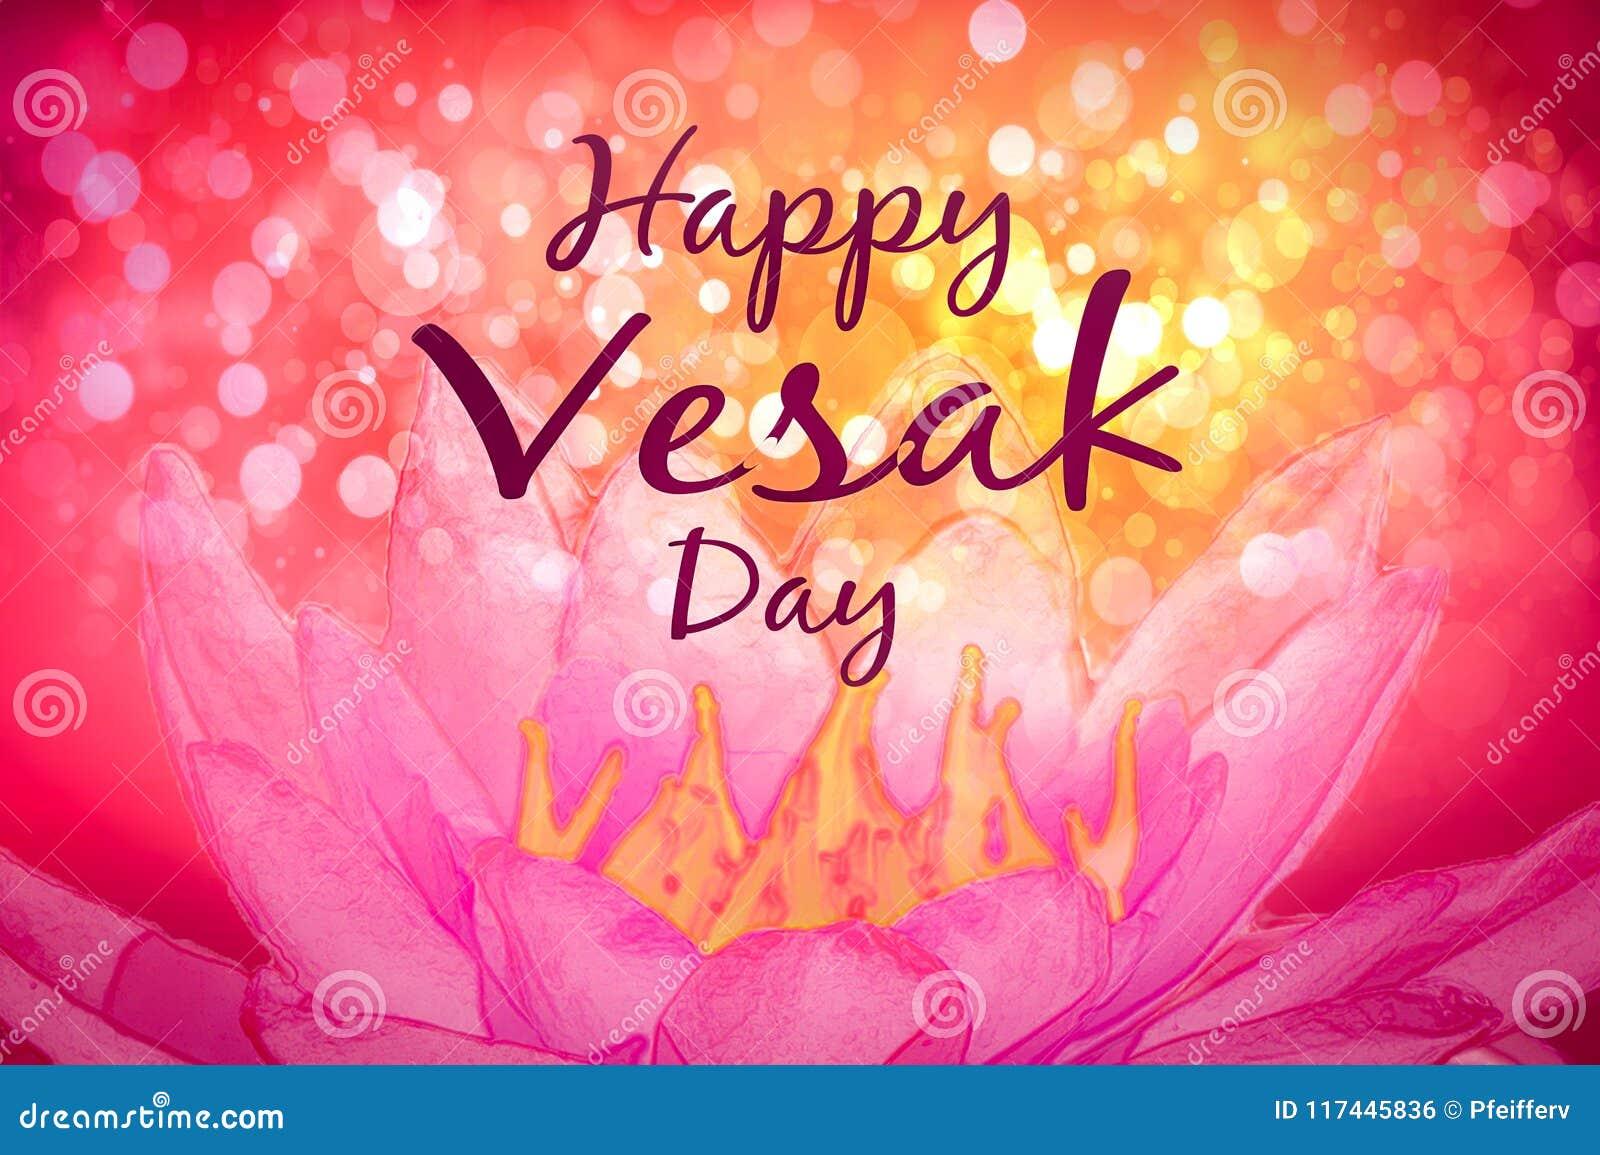 Vesak Day Greeting Card Stock Illustration Illustration Of